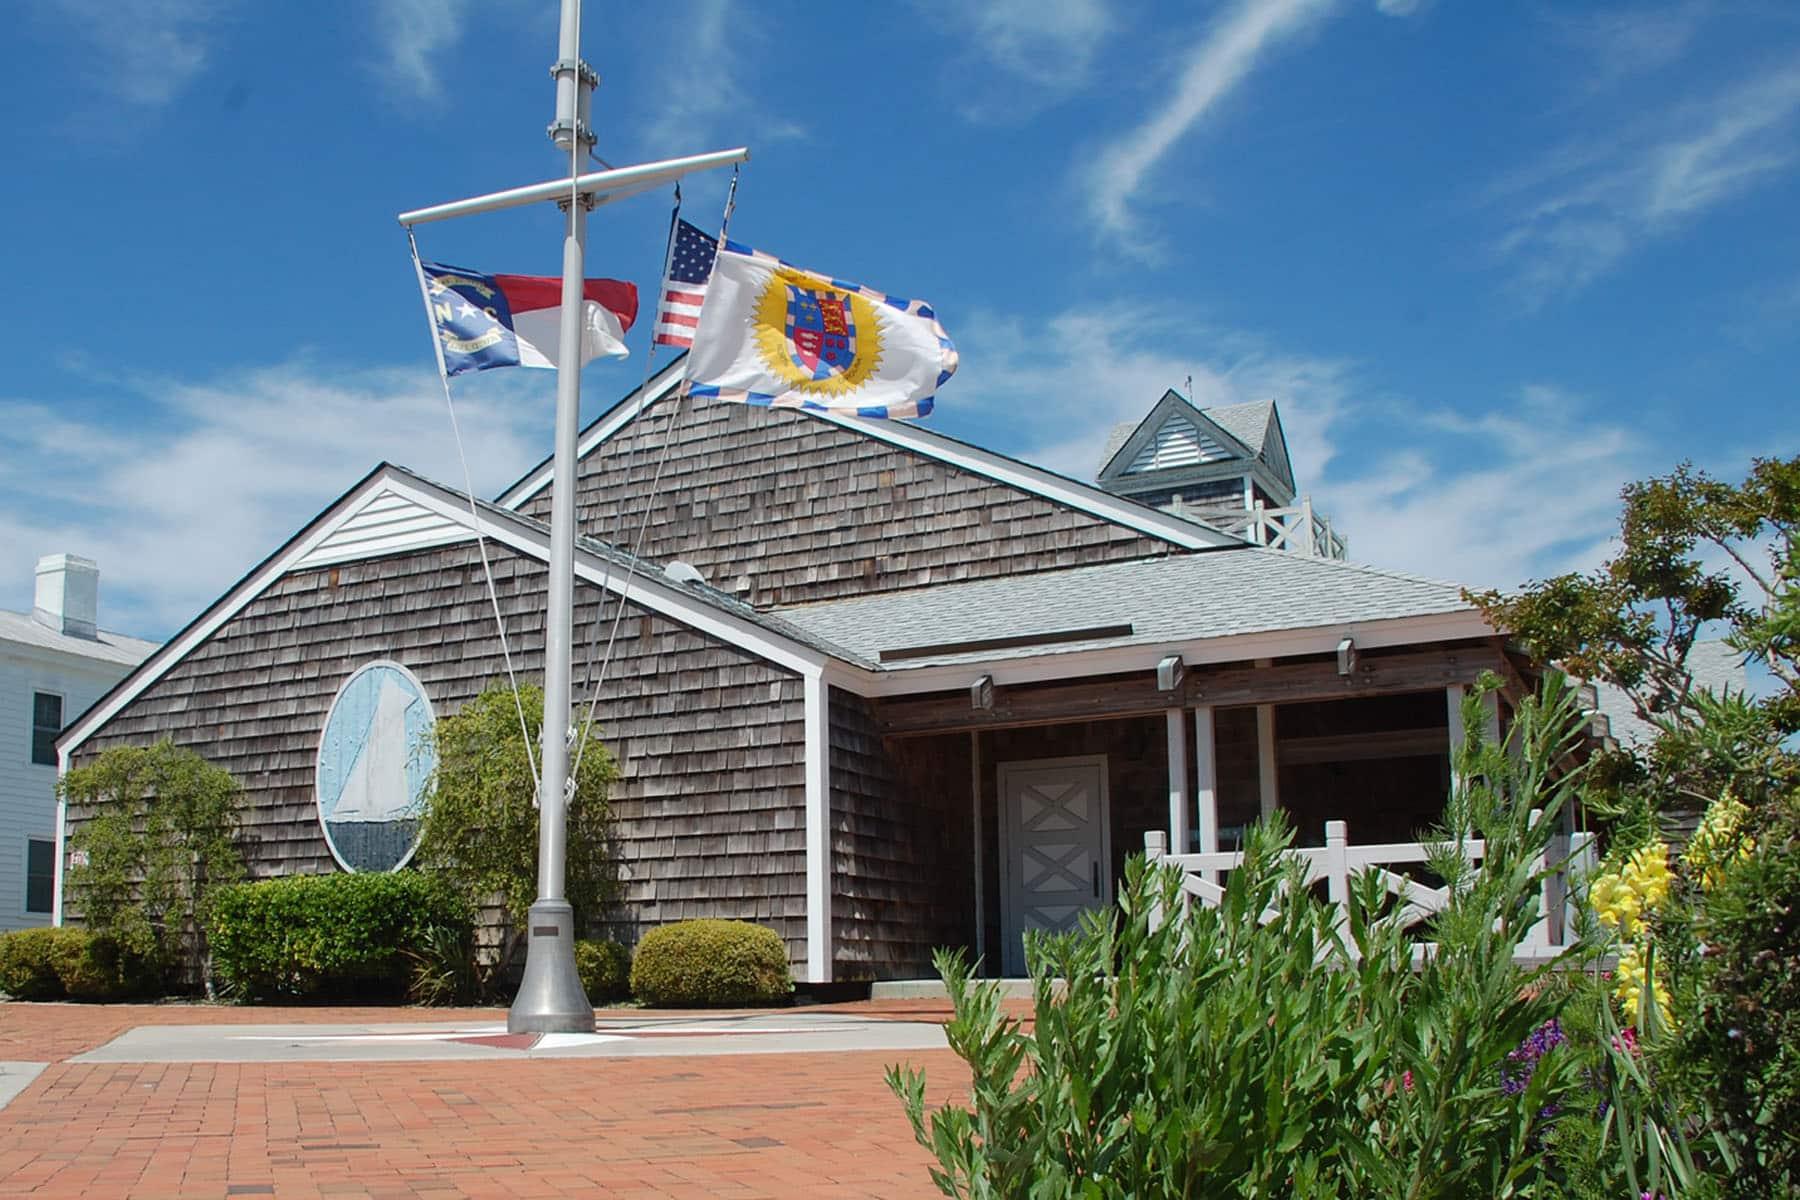 North Carolina Maritime Museum at Beaufort